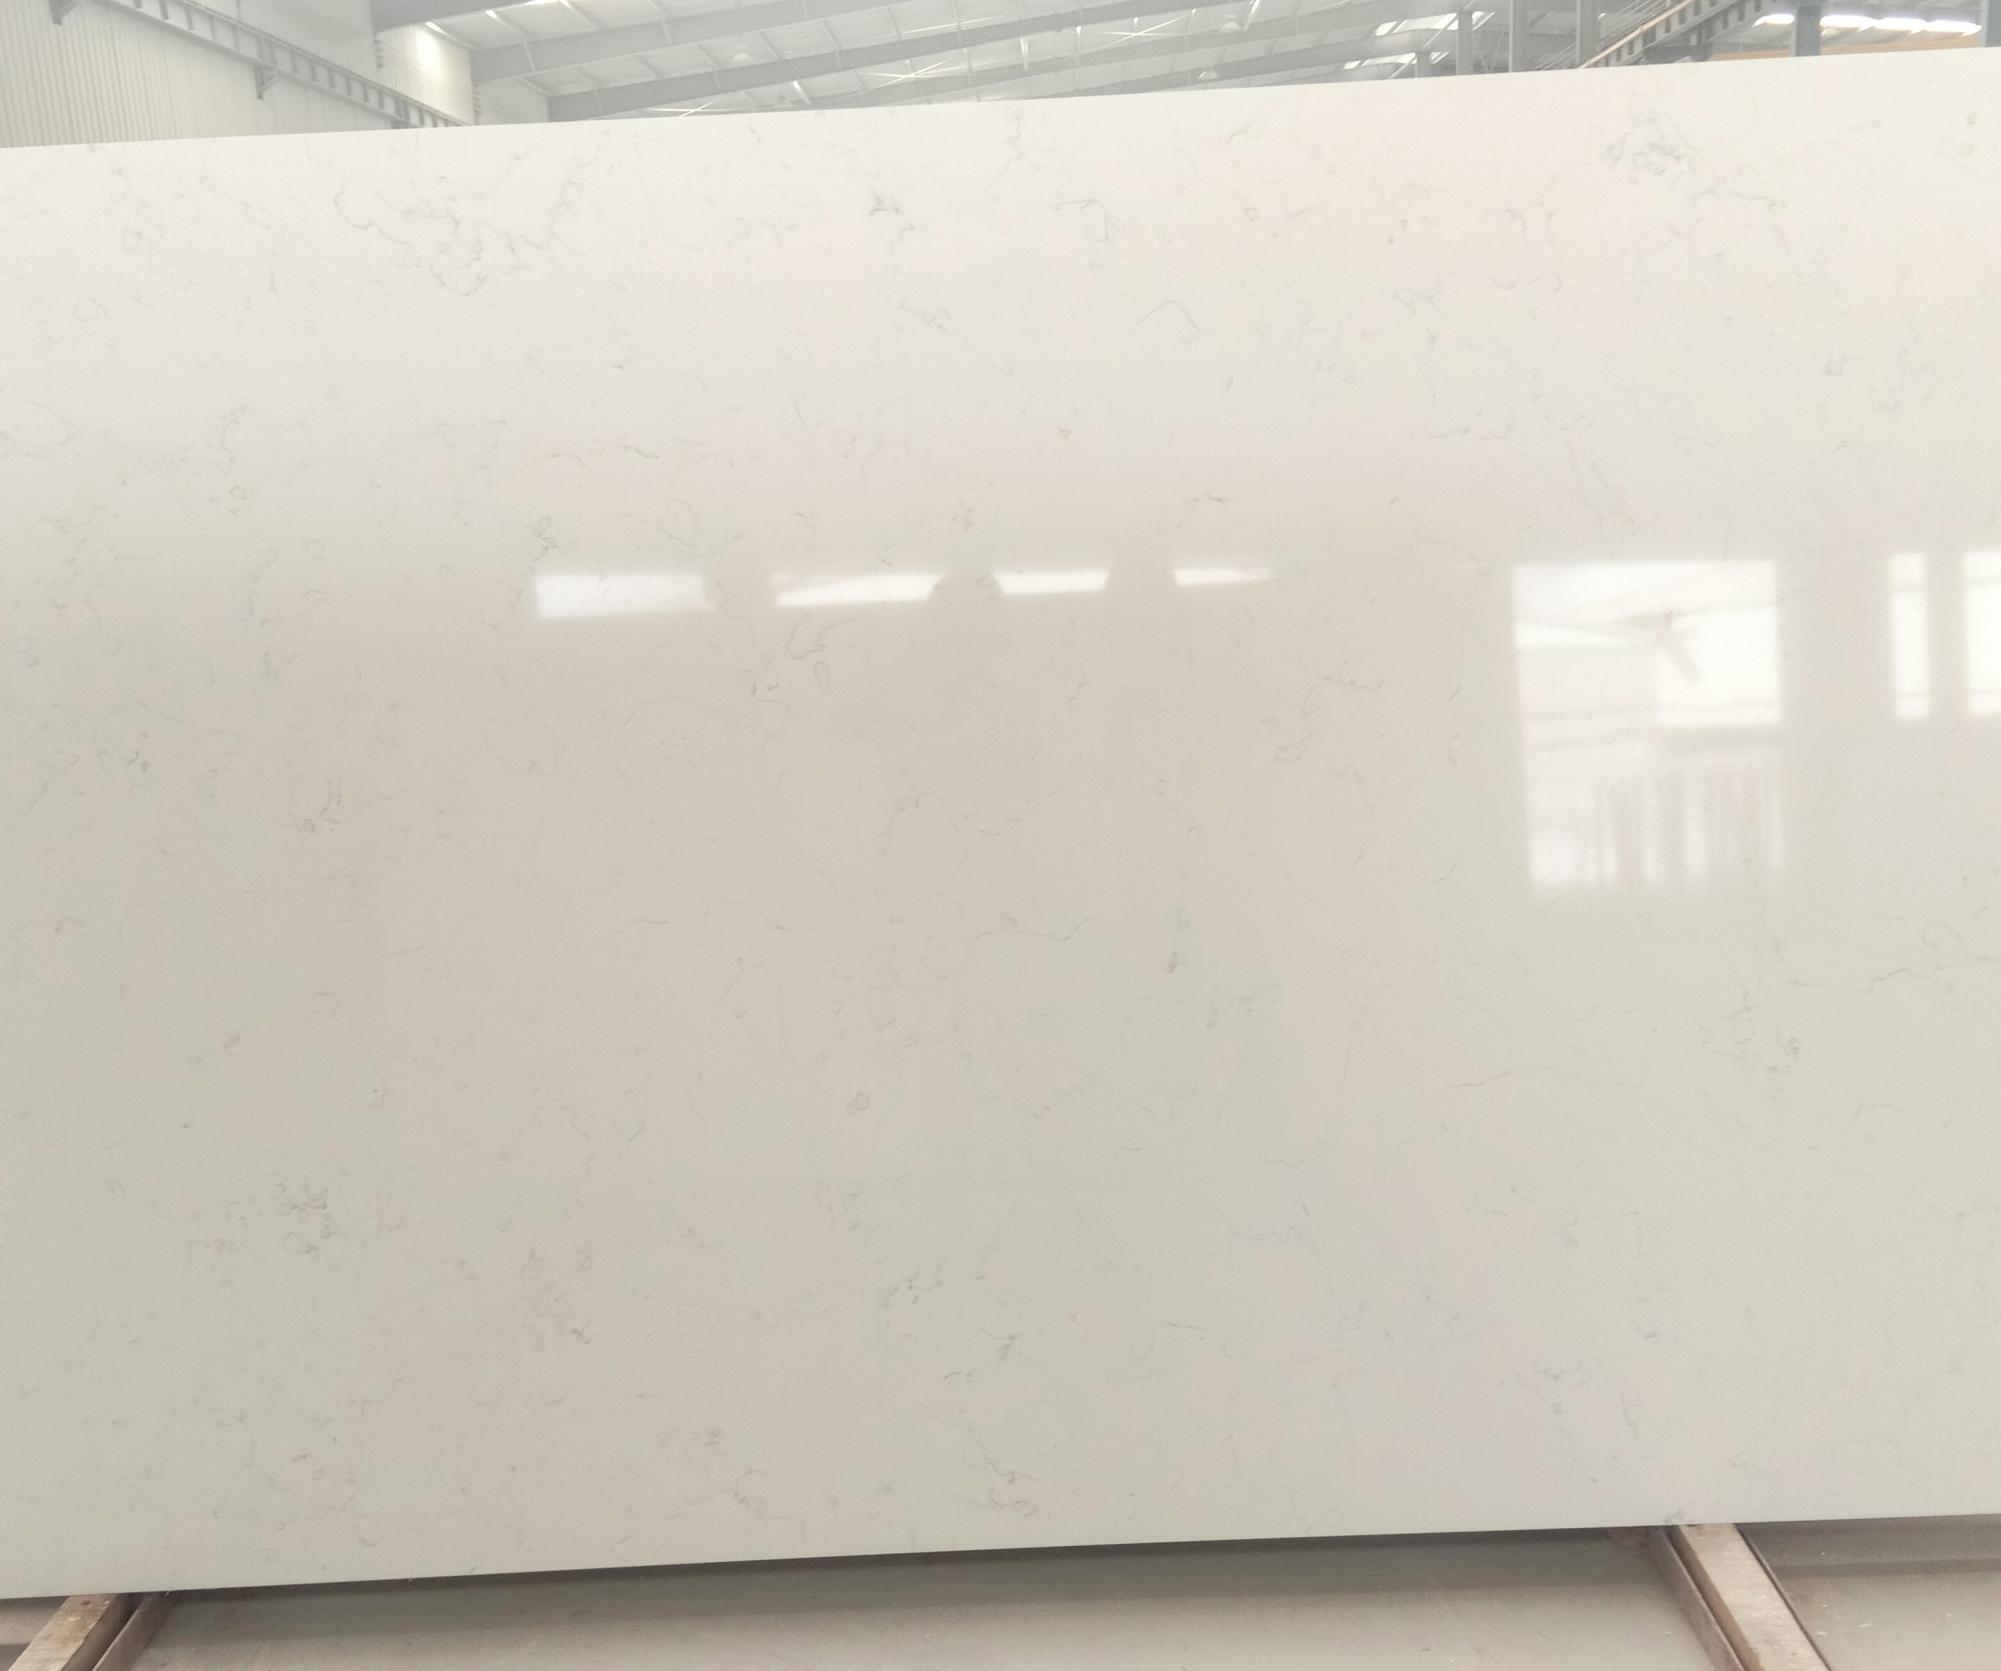 Venetian White Suministro Hai Phong (Vietnam) de planchas pulidas en cuarzo aglomerado artificial 6302 , SL2CM